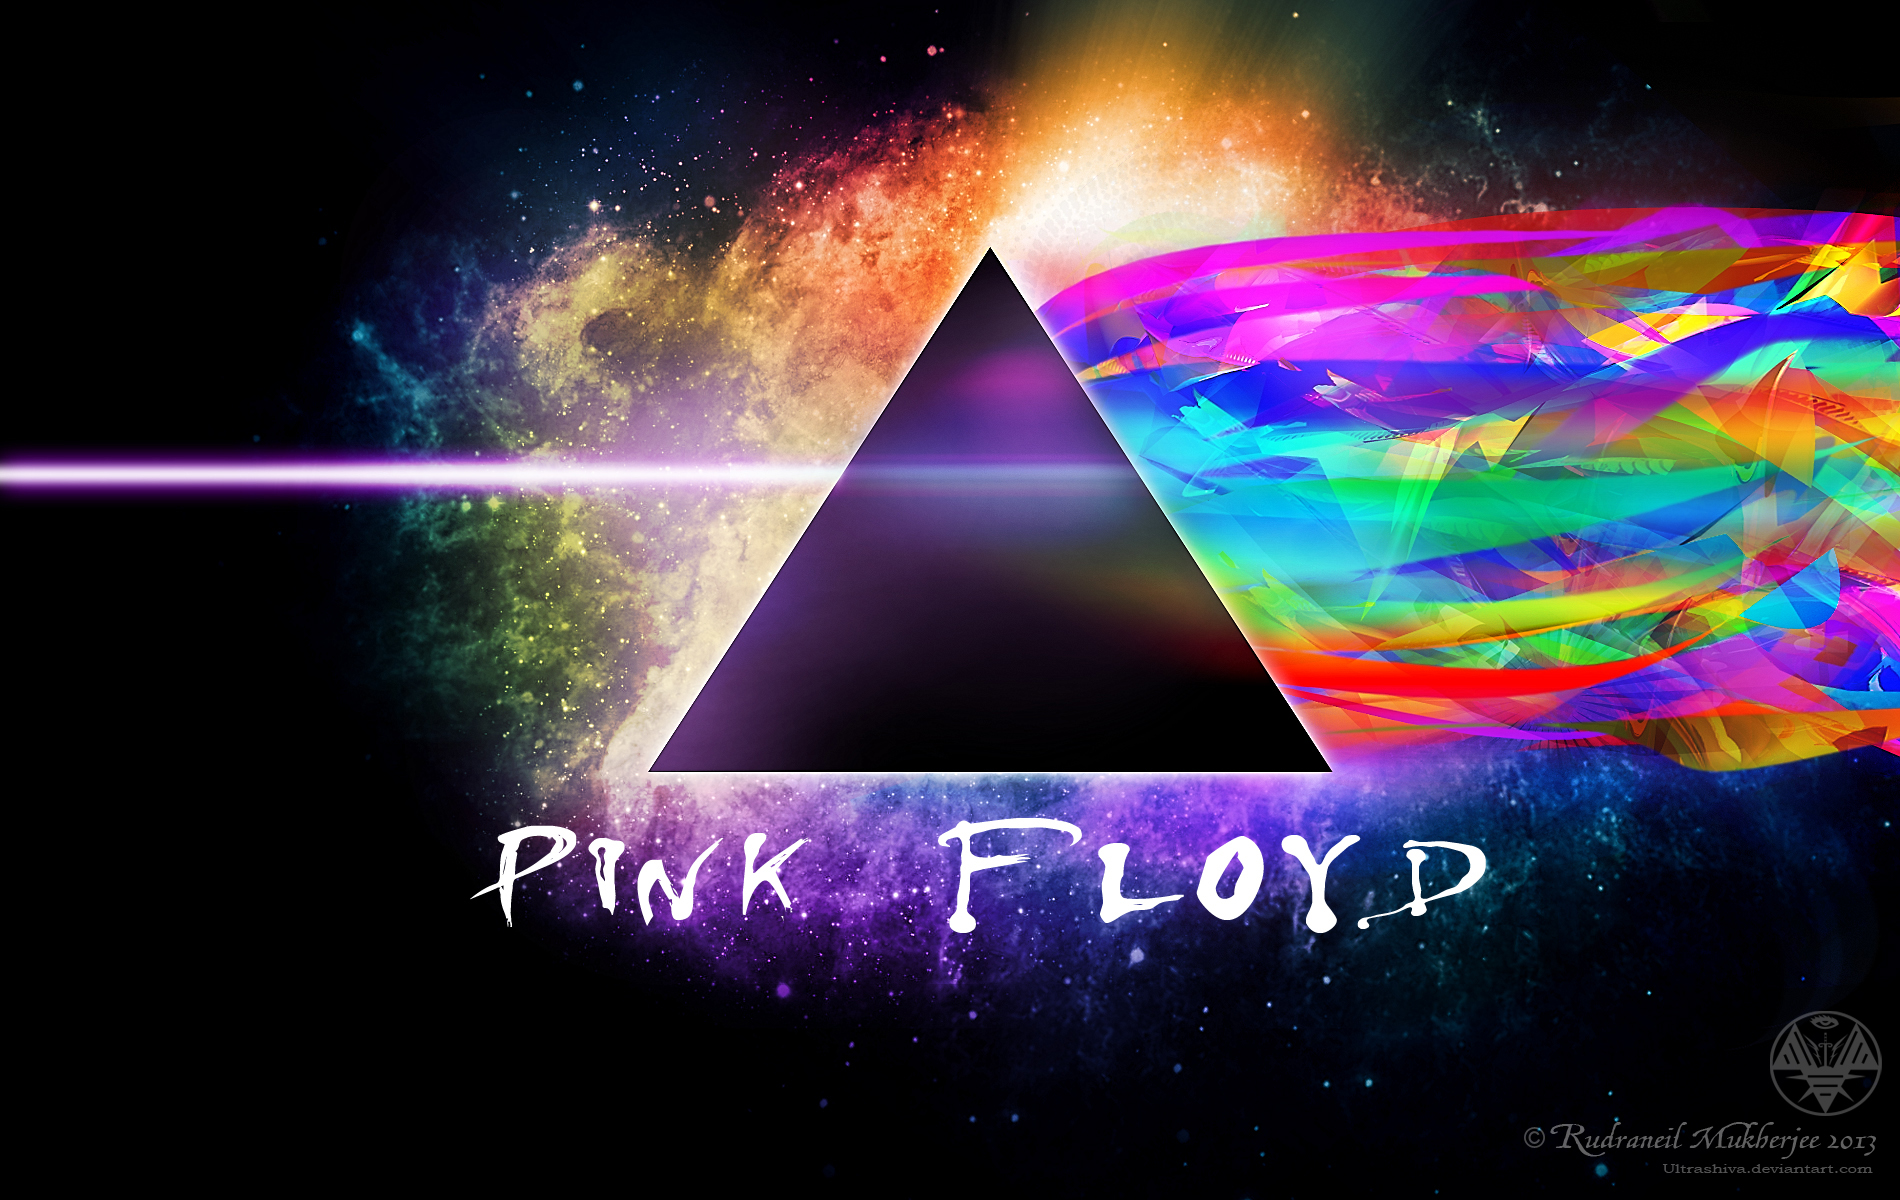 Pink Floyd Wallpaper 1 by UltraShiva 1900x1200